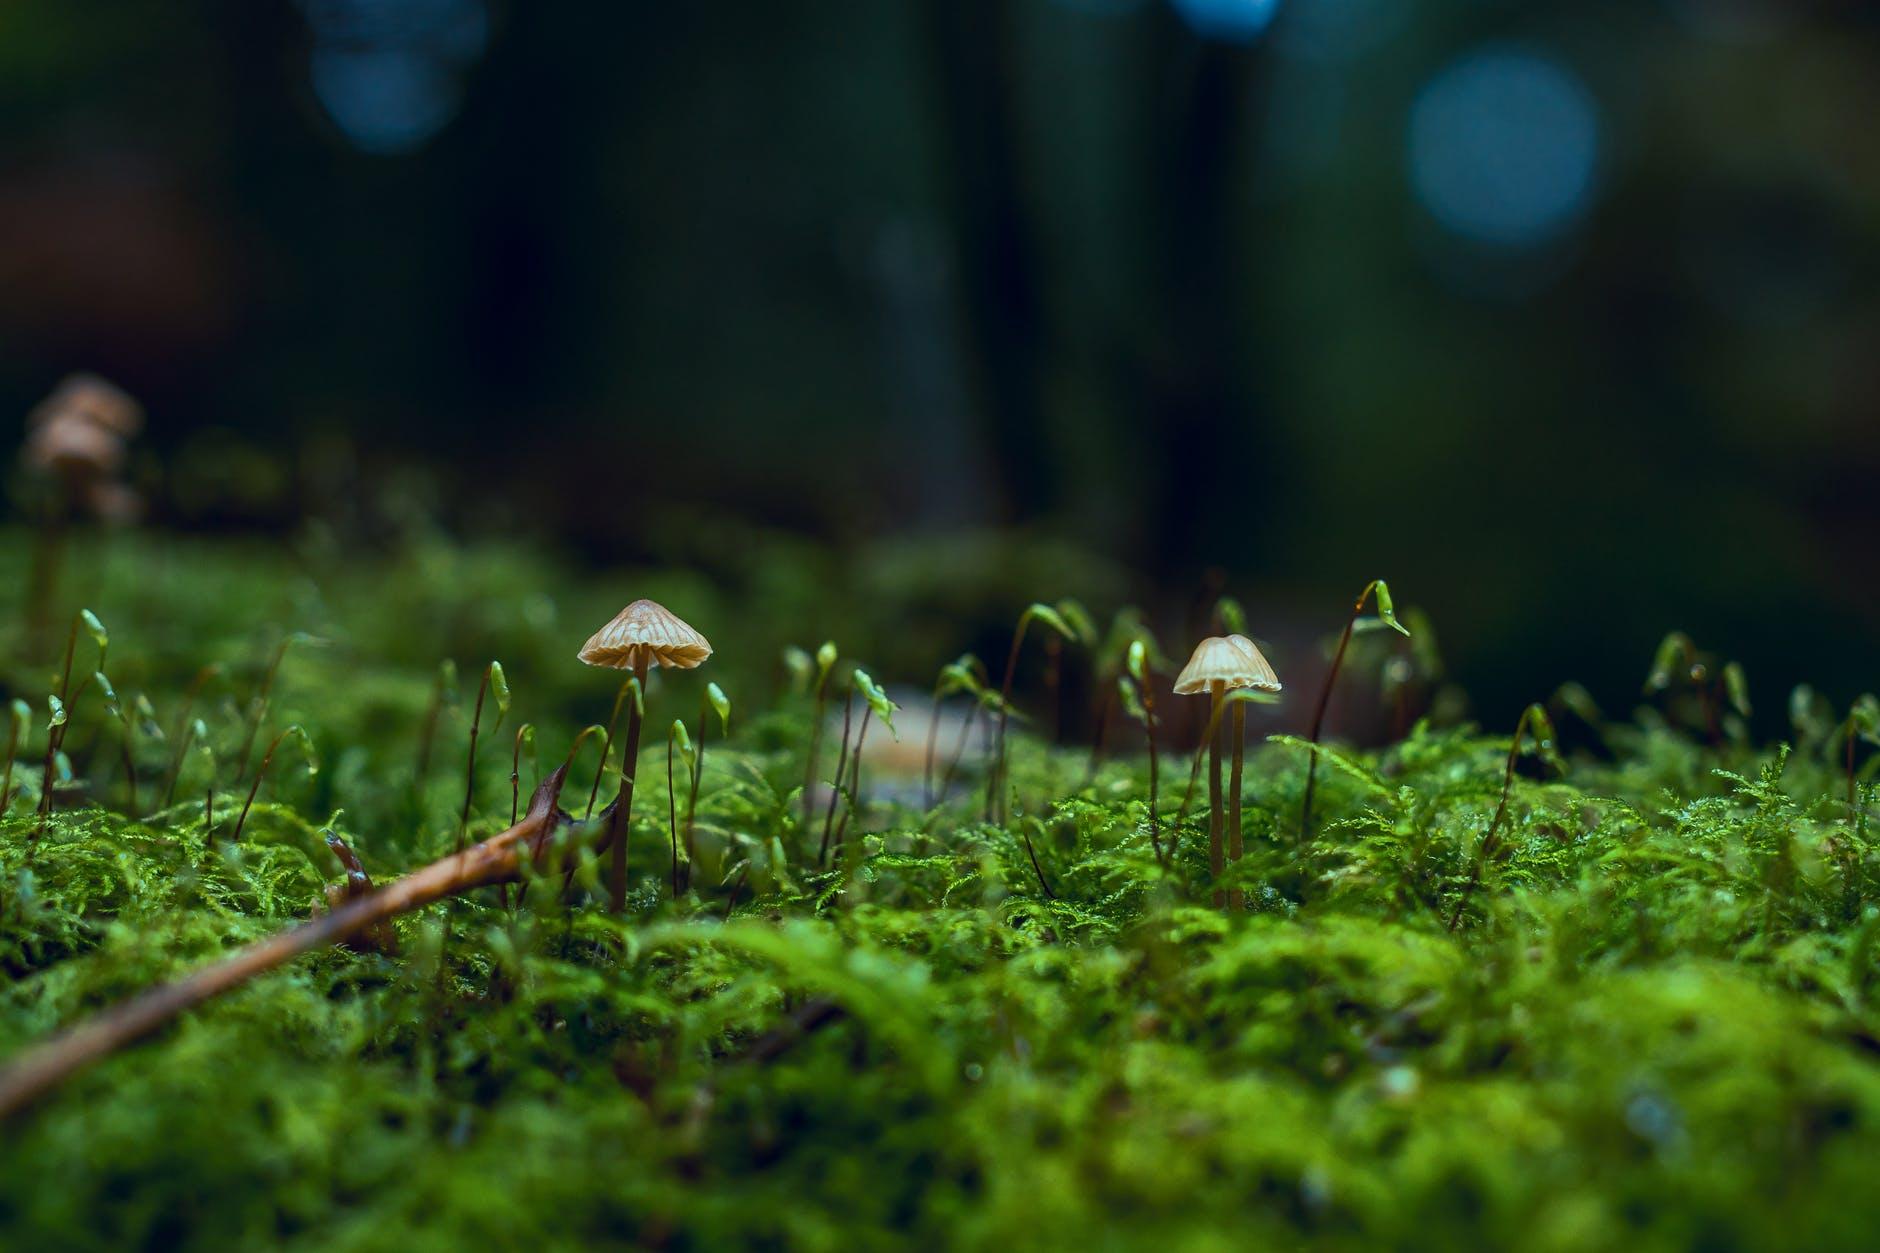 Psychedelic-MagicMushrooms-TheWeedBlog